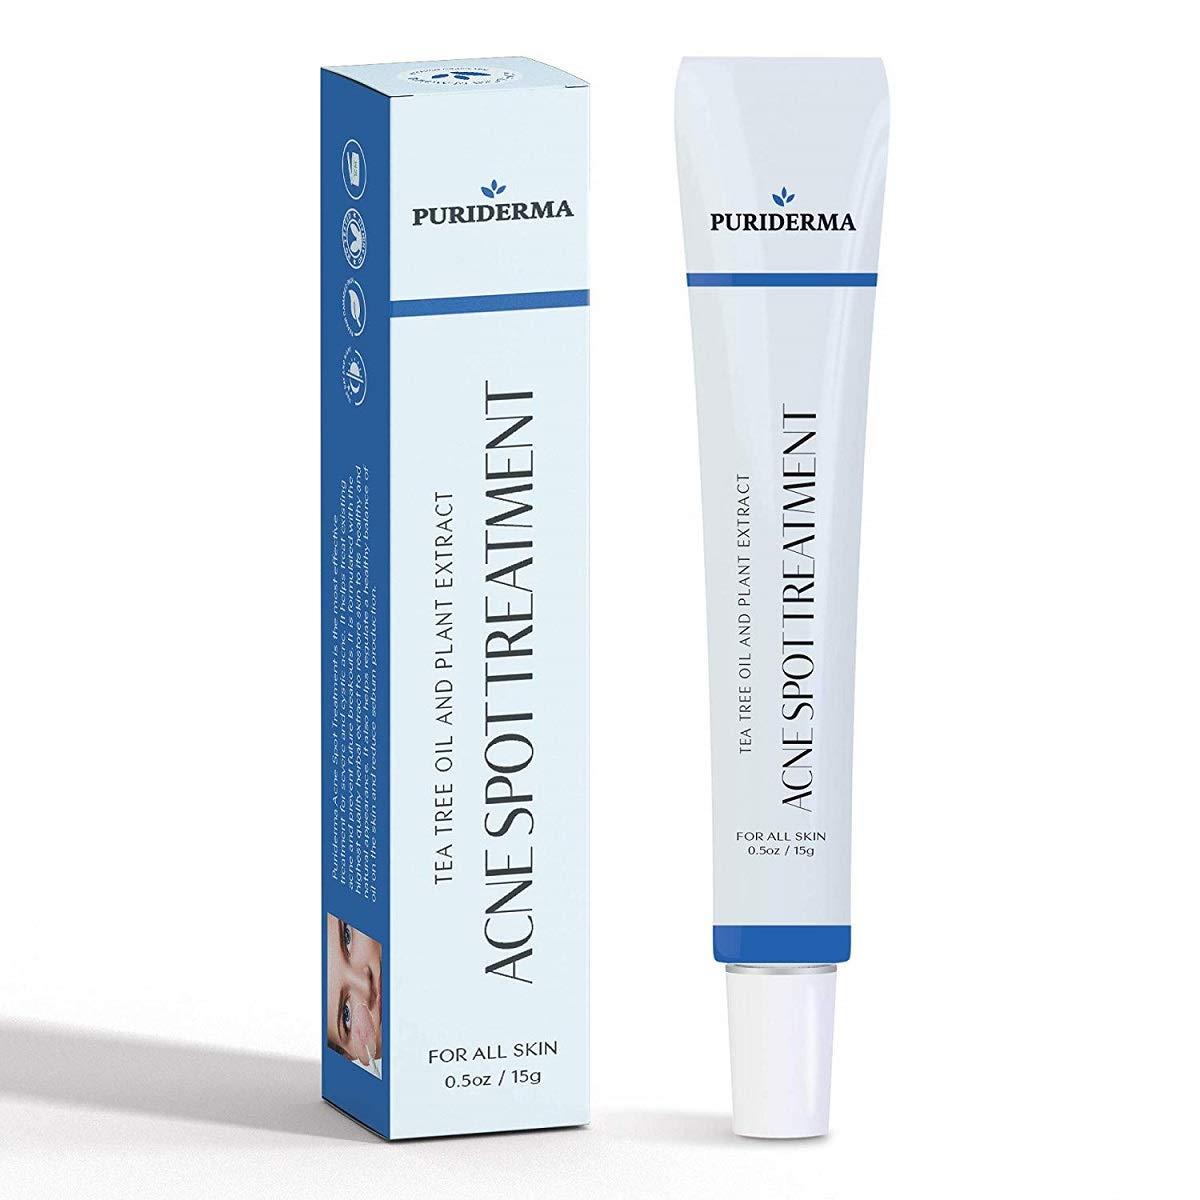 Puriderma-acne-spot-treatment-amazon